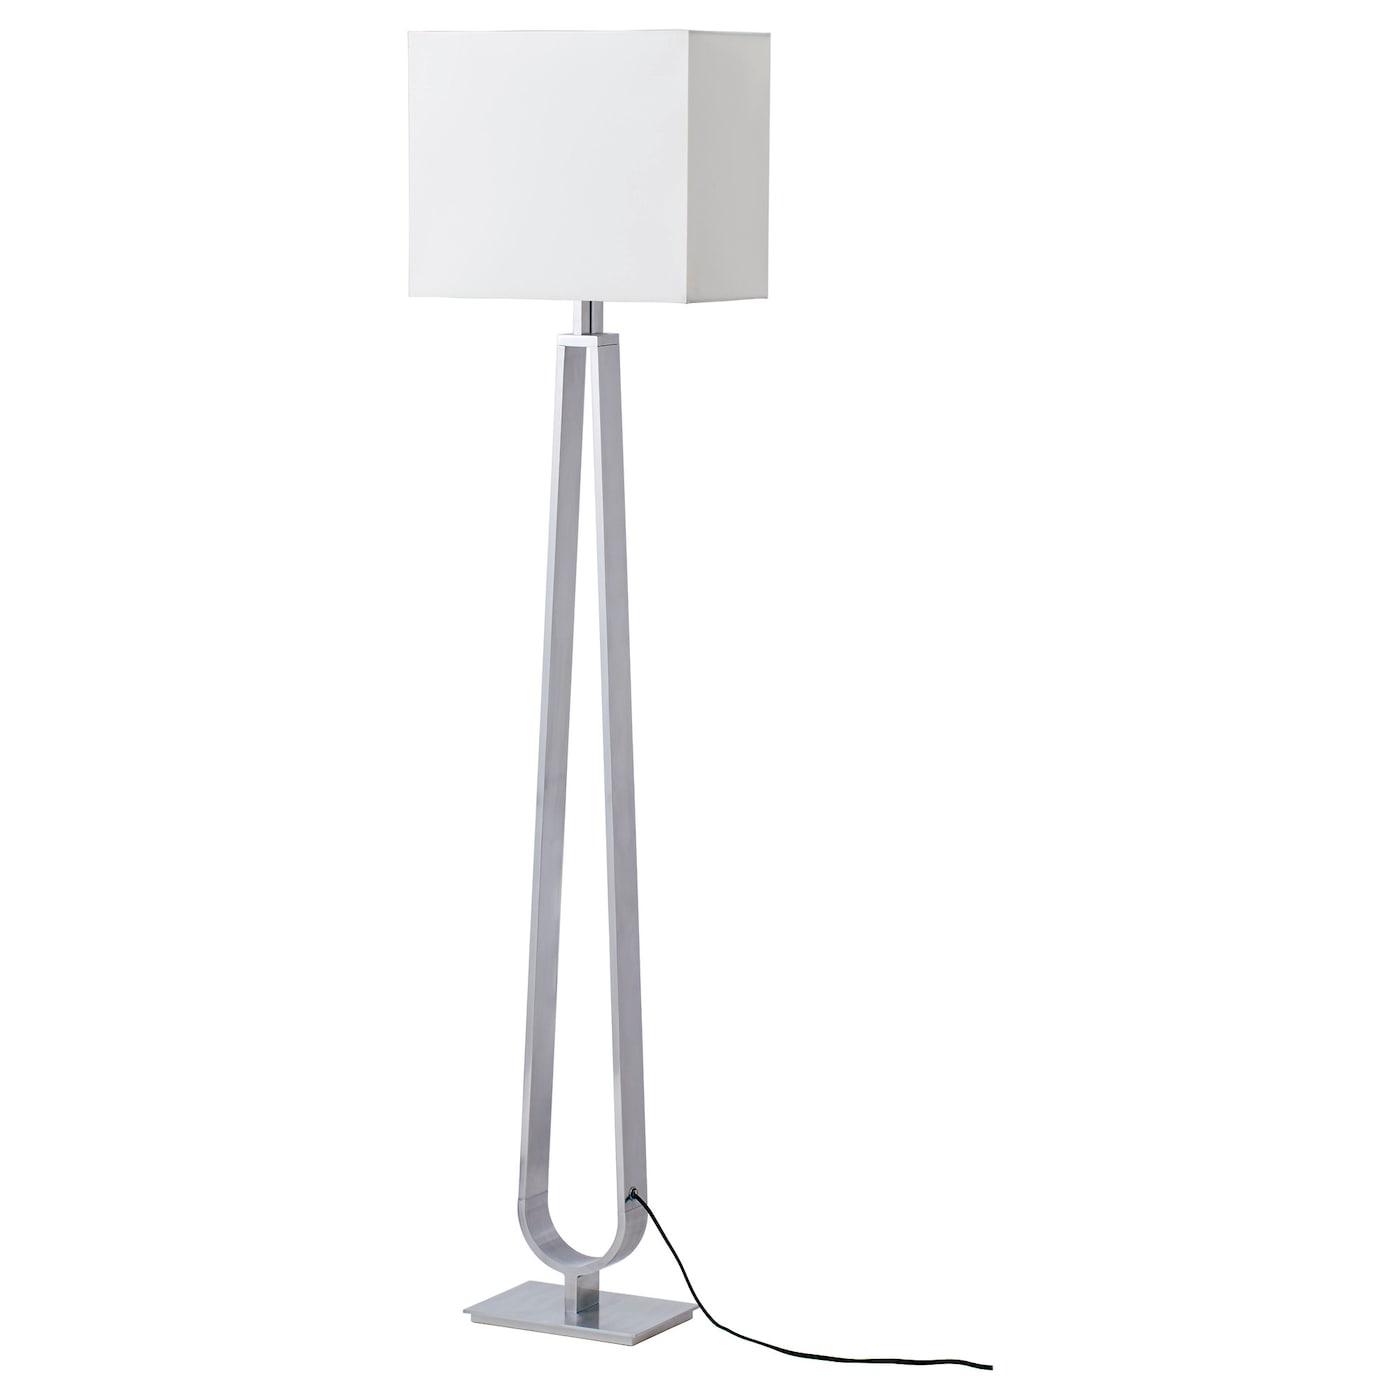 IKEA KLABB Off White, Nickel Plated